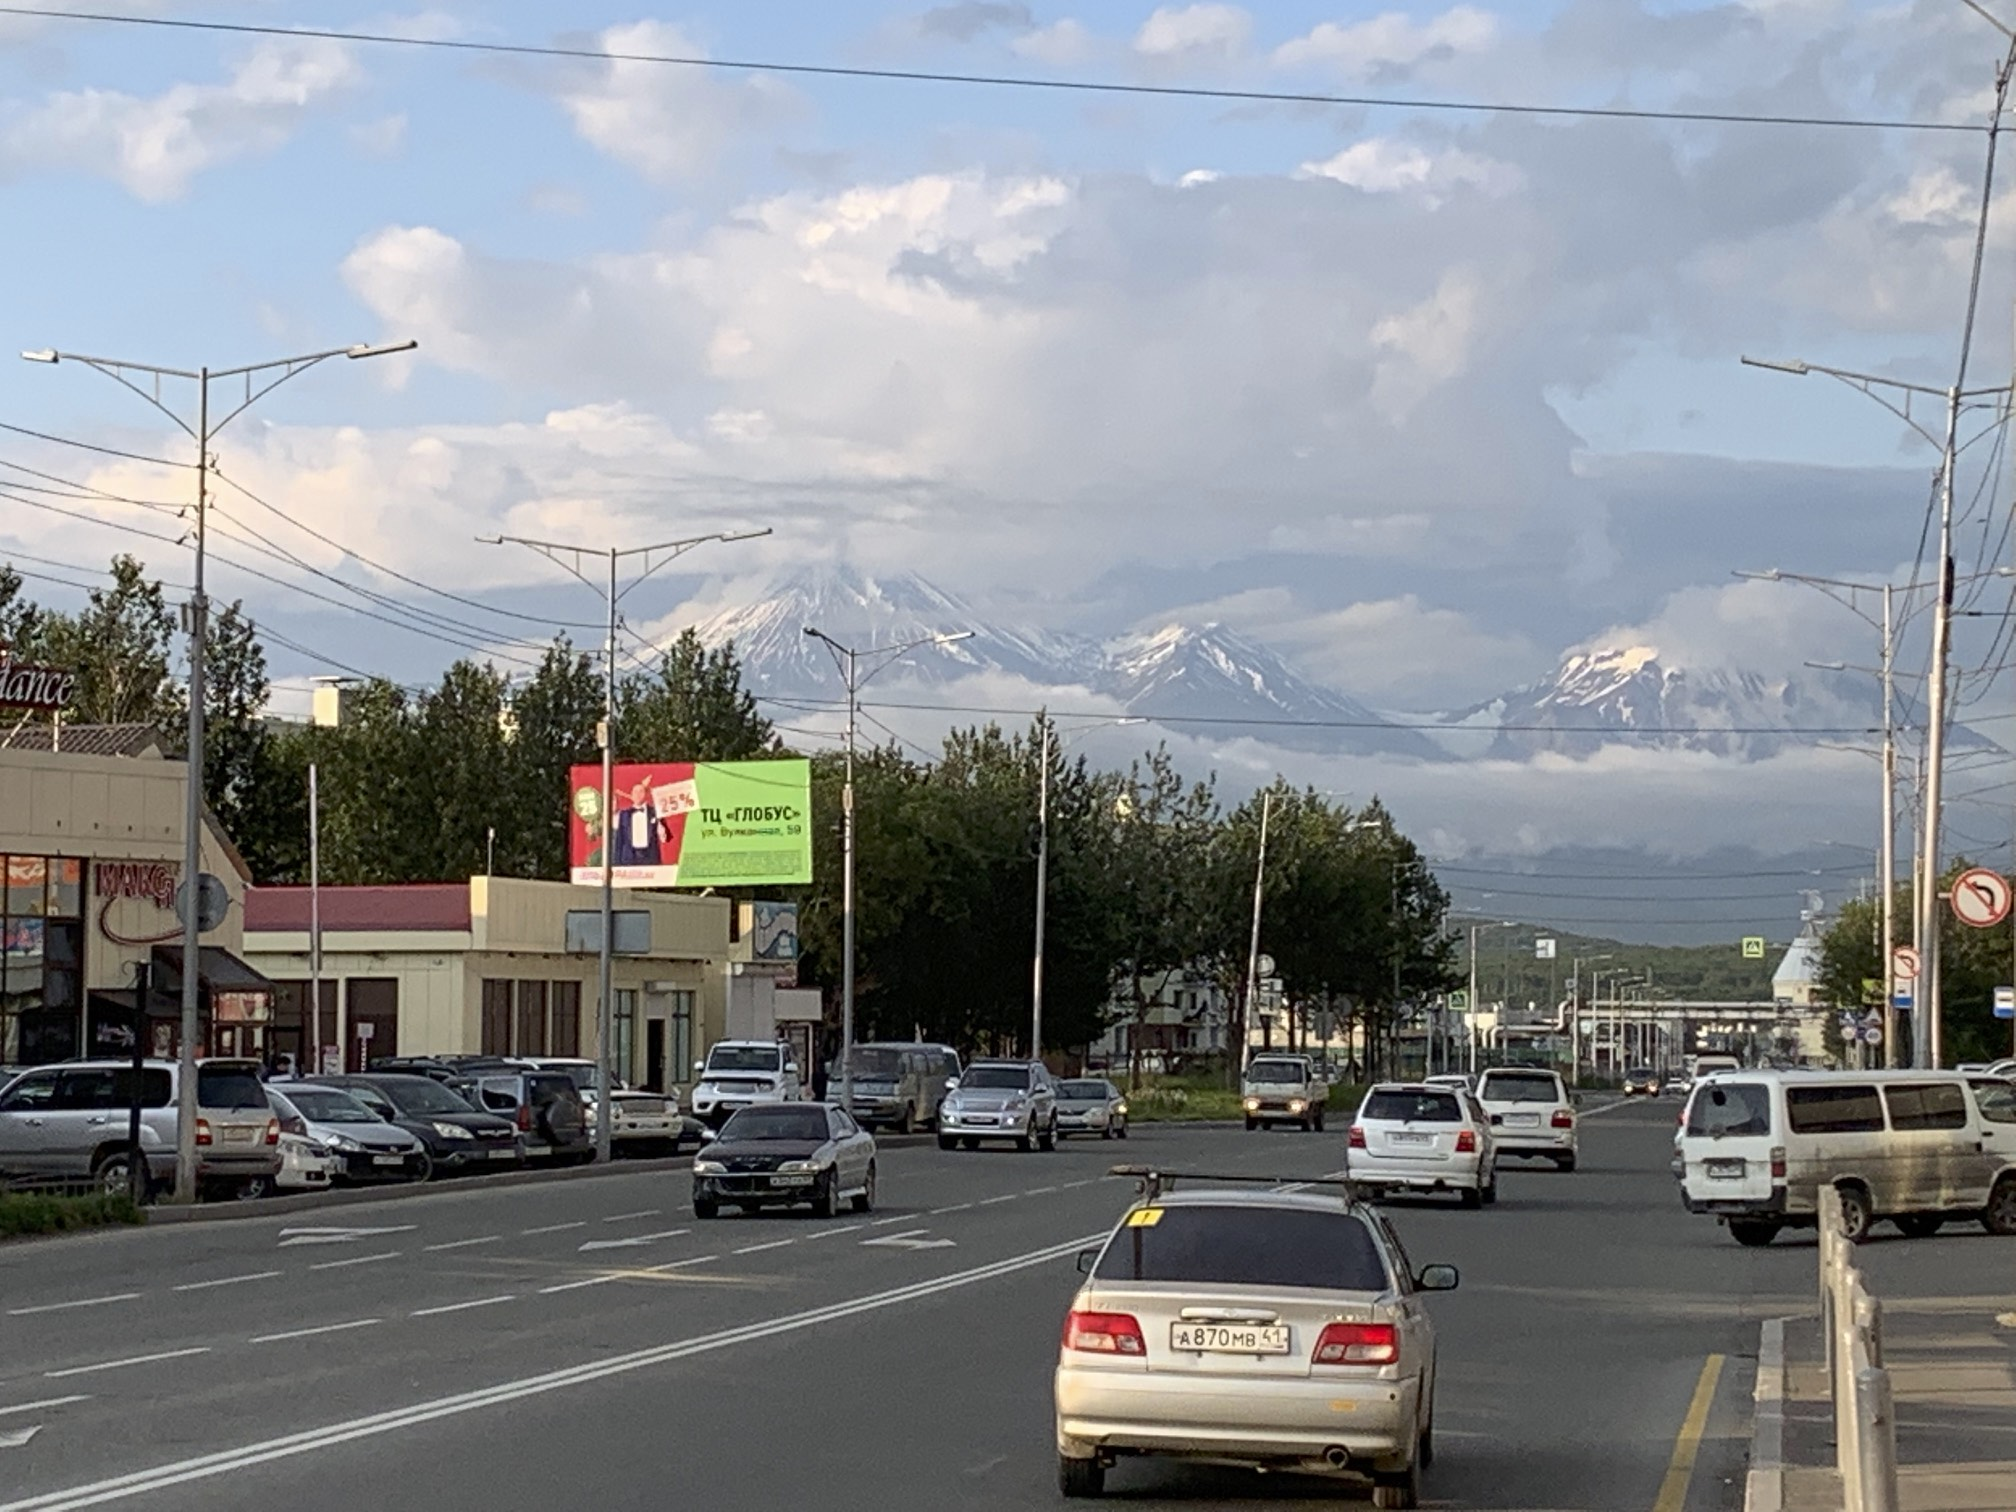 Petropawlowsk-Kamchatsky